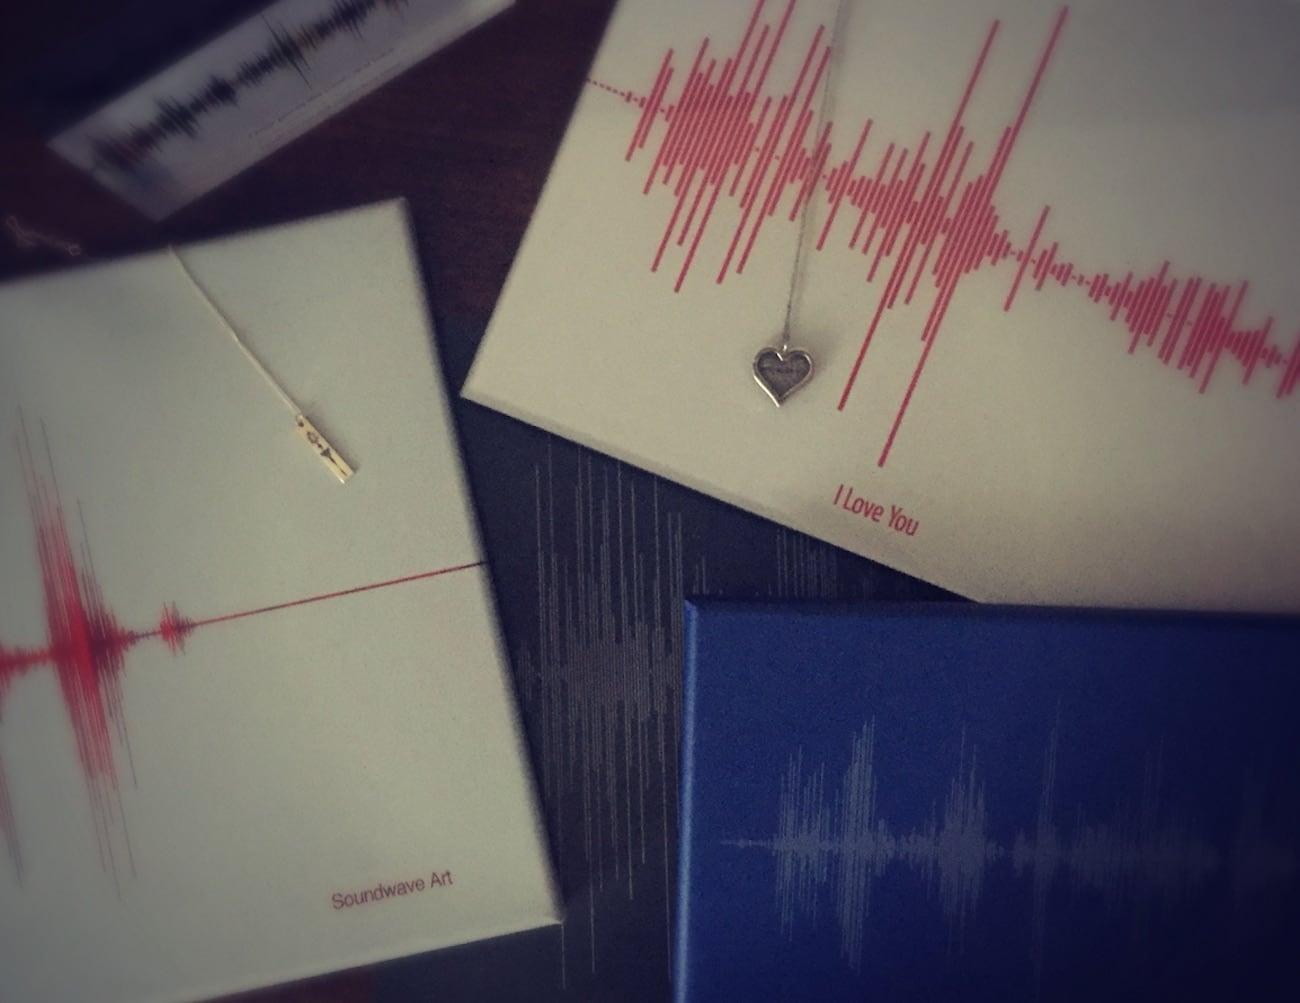 Soundwave Art Custom Sound Art Collection